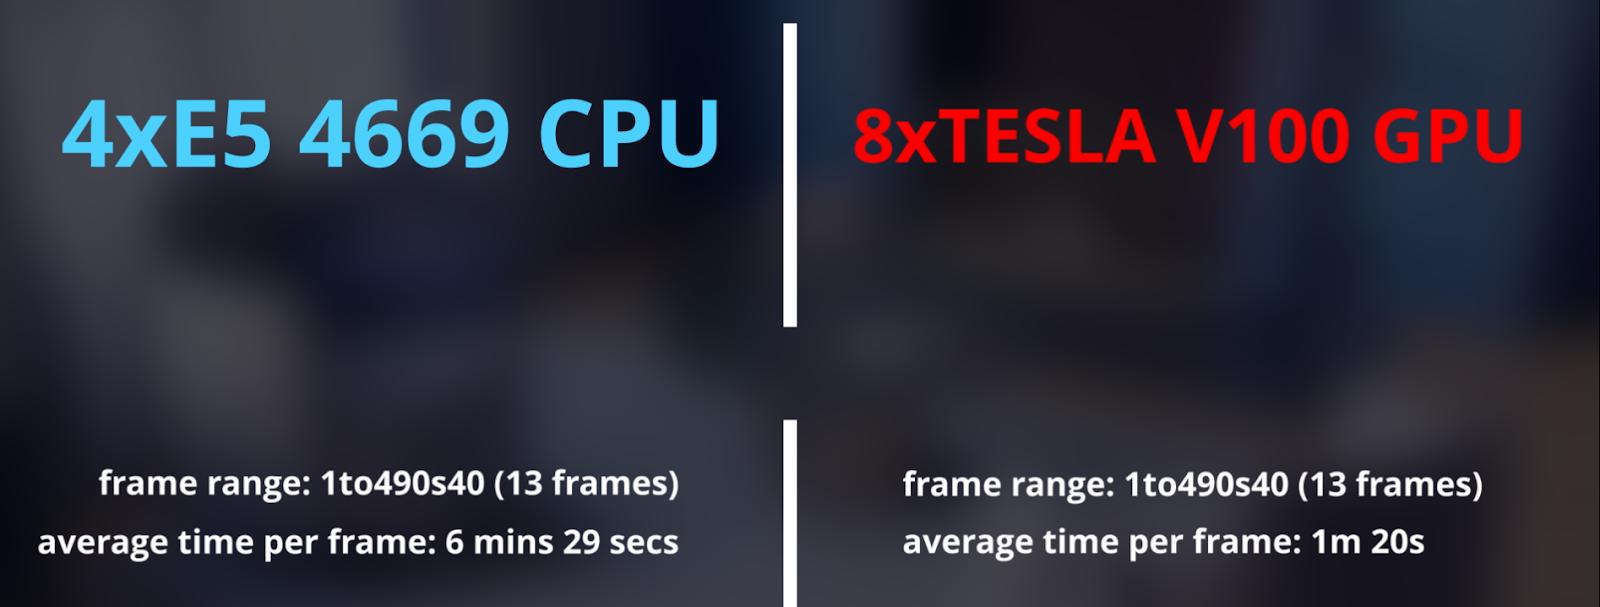 GPU server test results